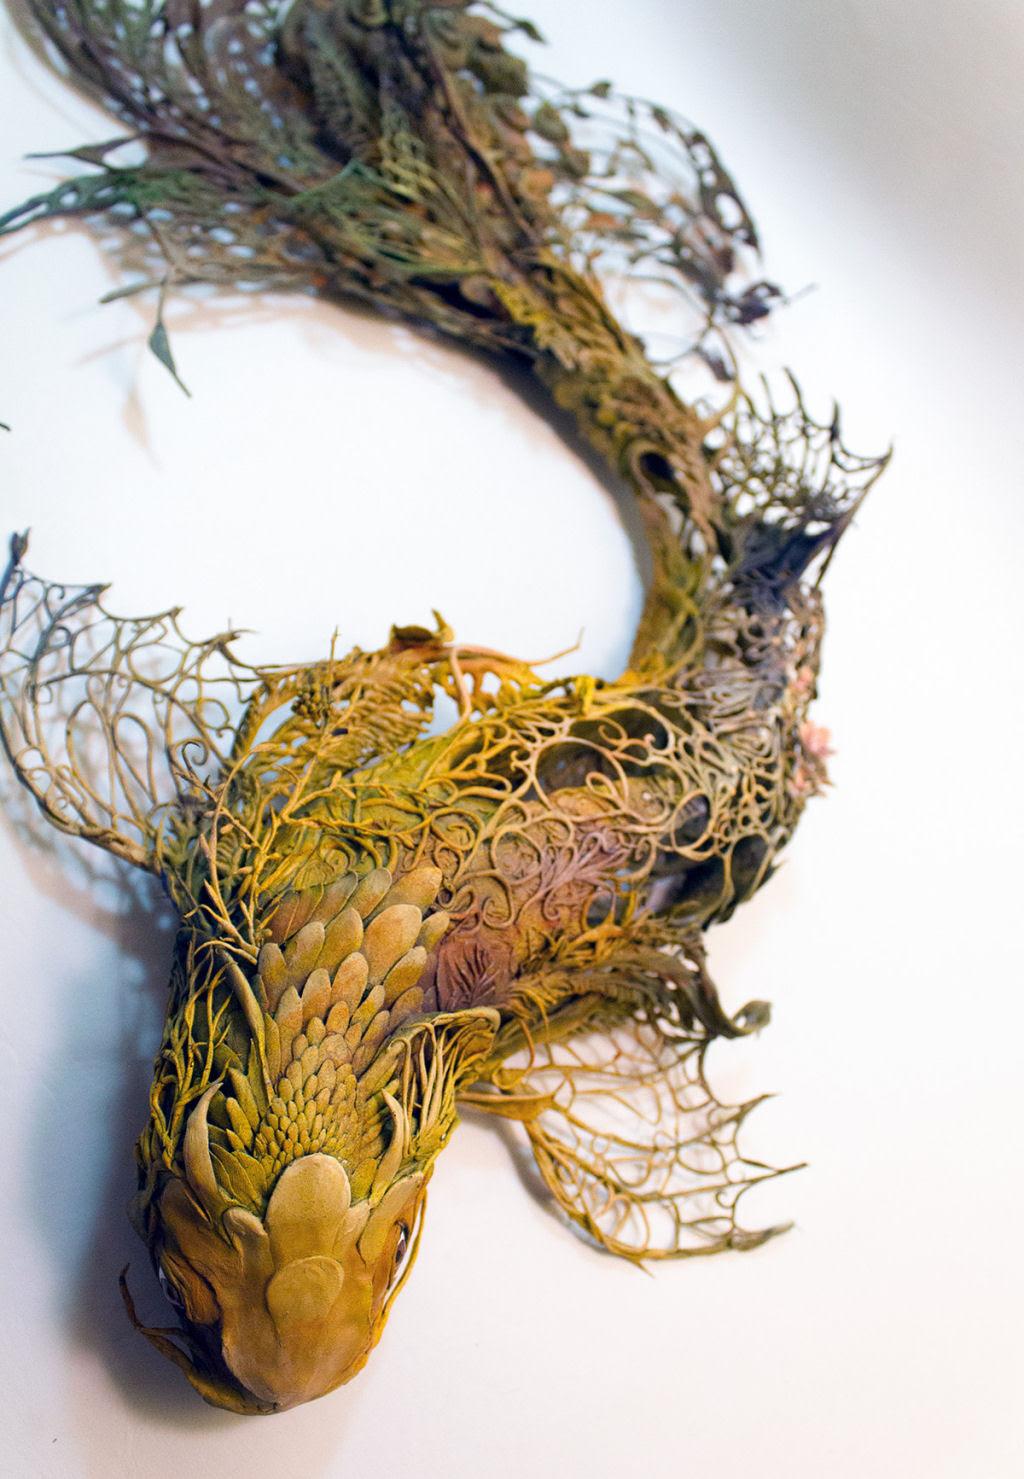 As esculturas surrealistas de Ellen Jewett mesclam plantas e vida animal 04